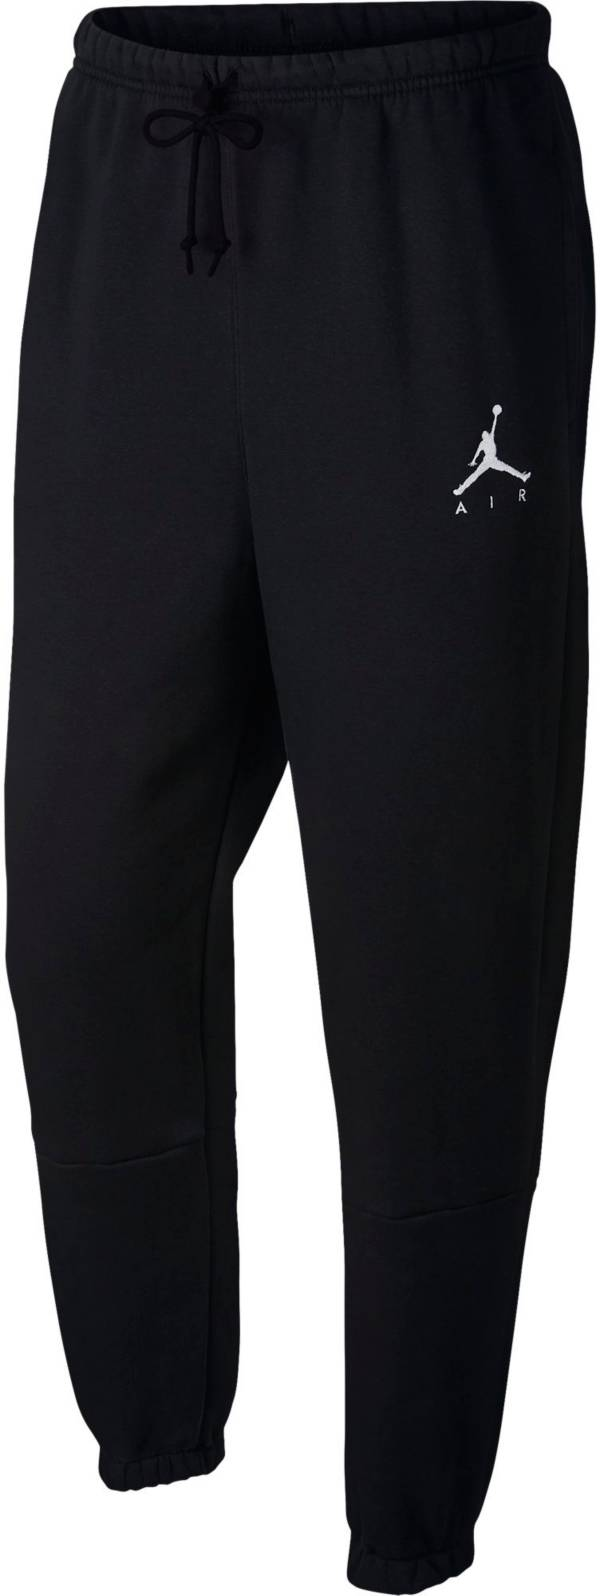 Jordan Men's Jumpman Air Fleece Pants product image